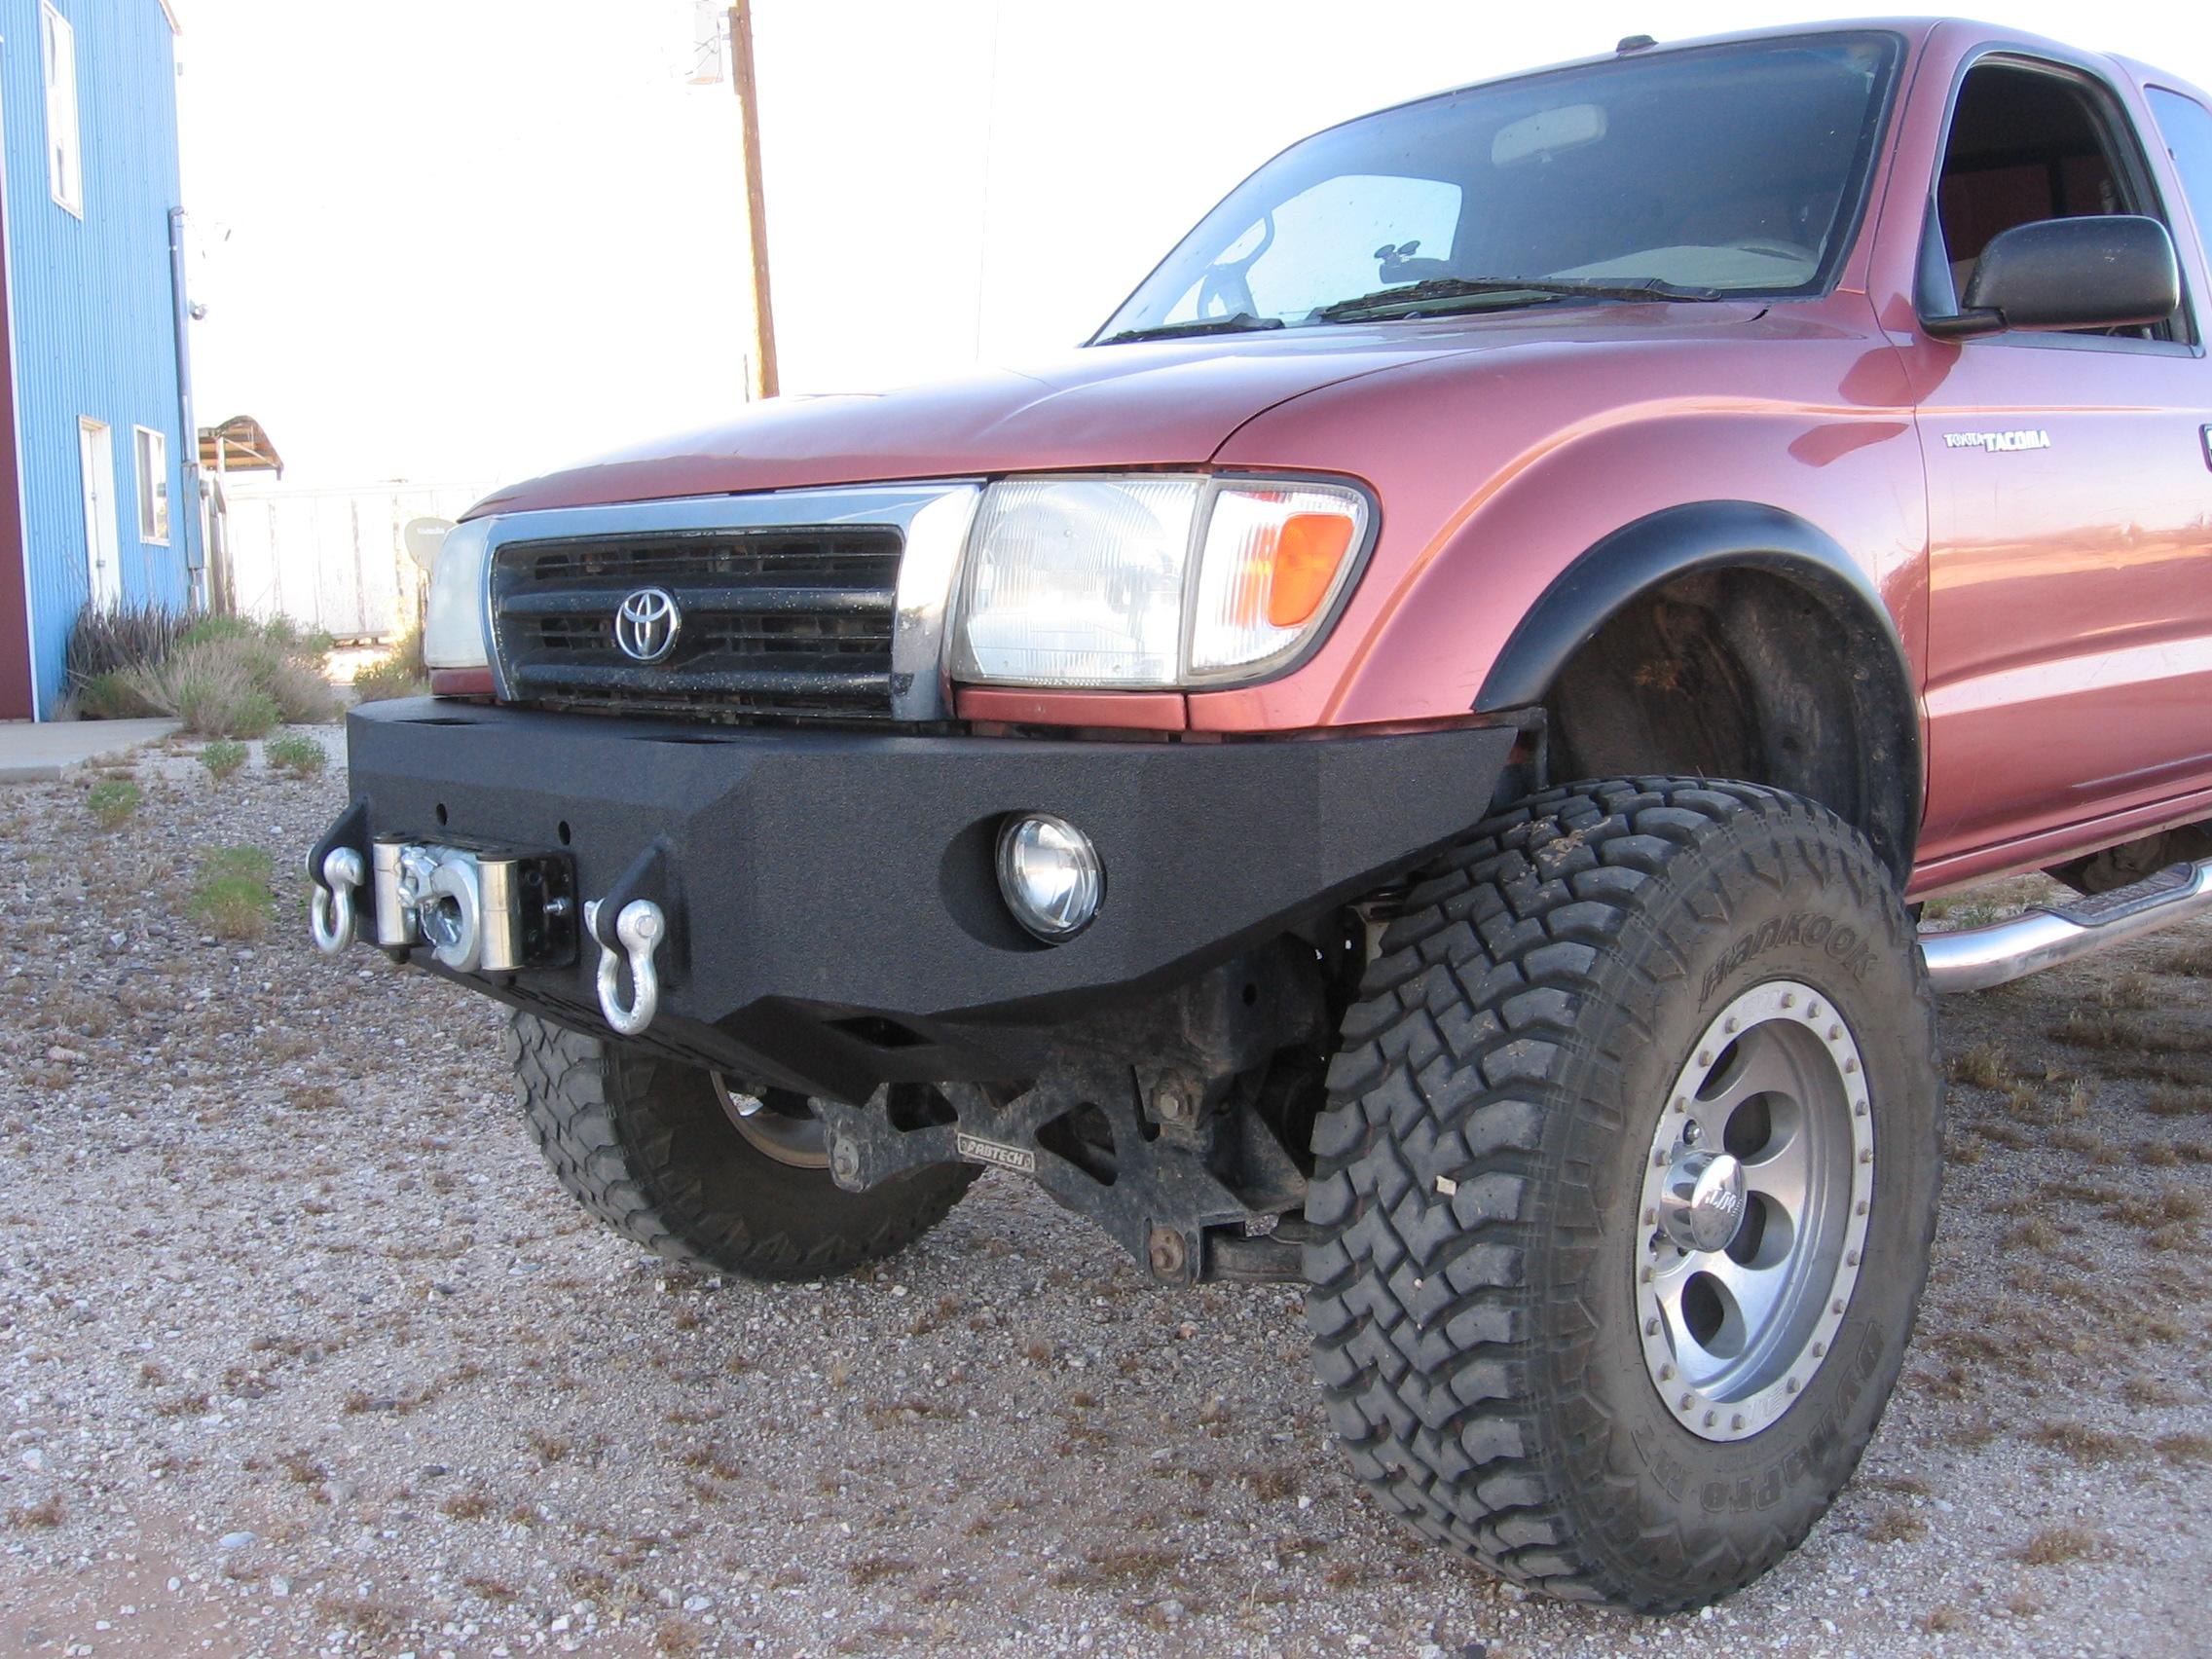 95 04 toyota tacoma front base bumper